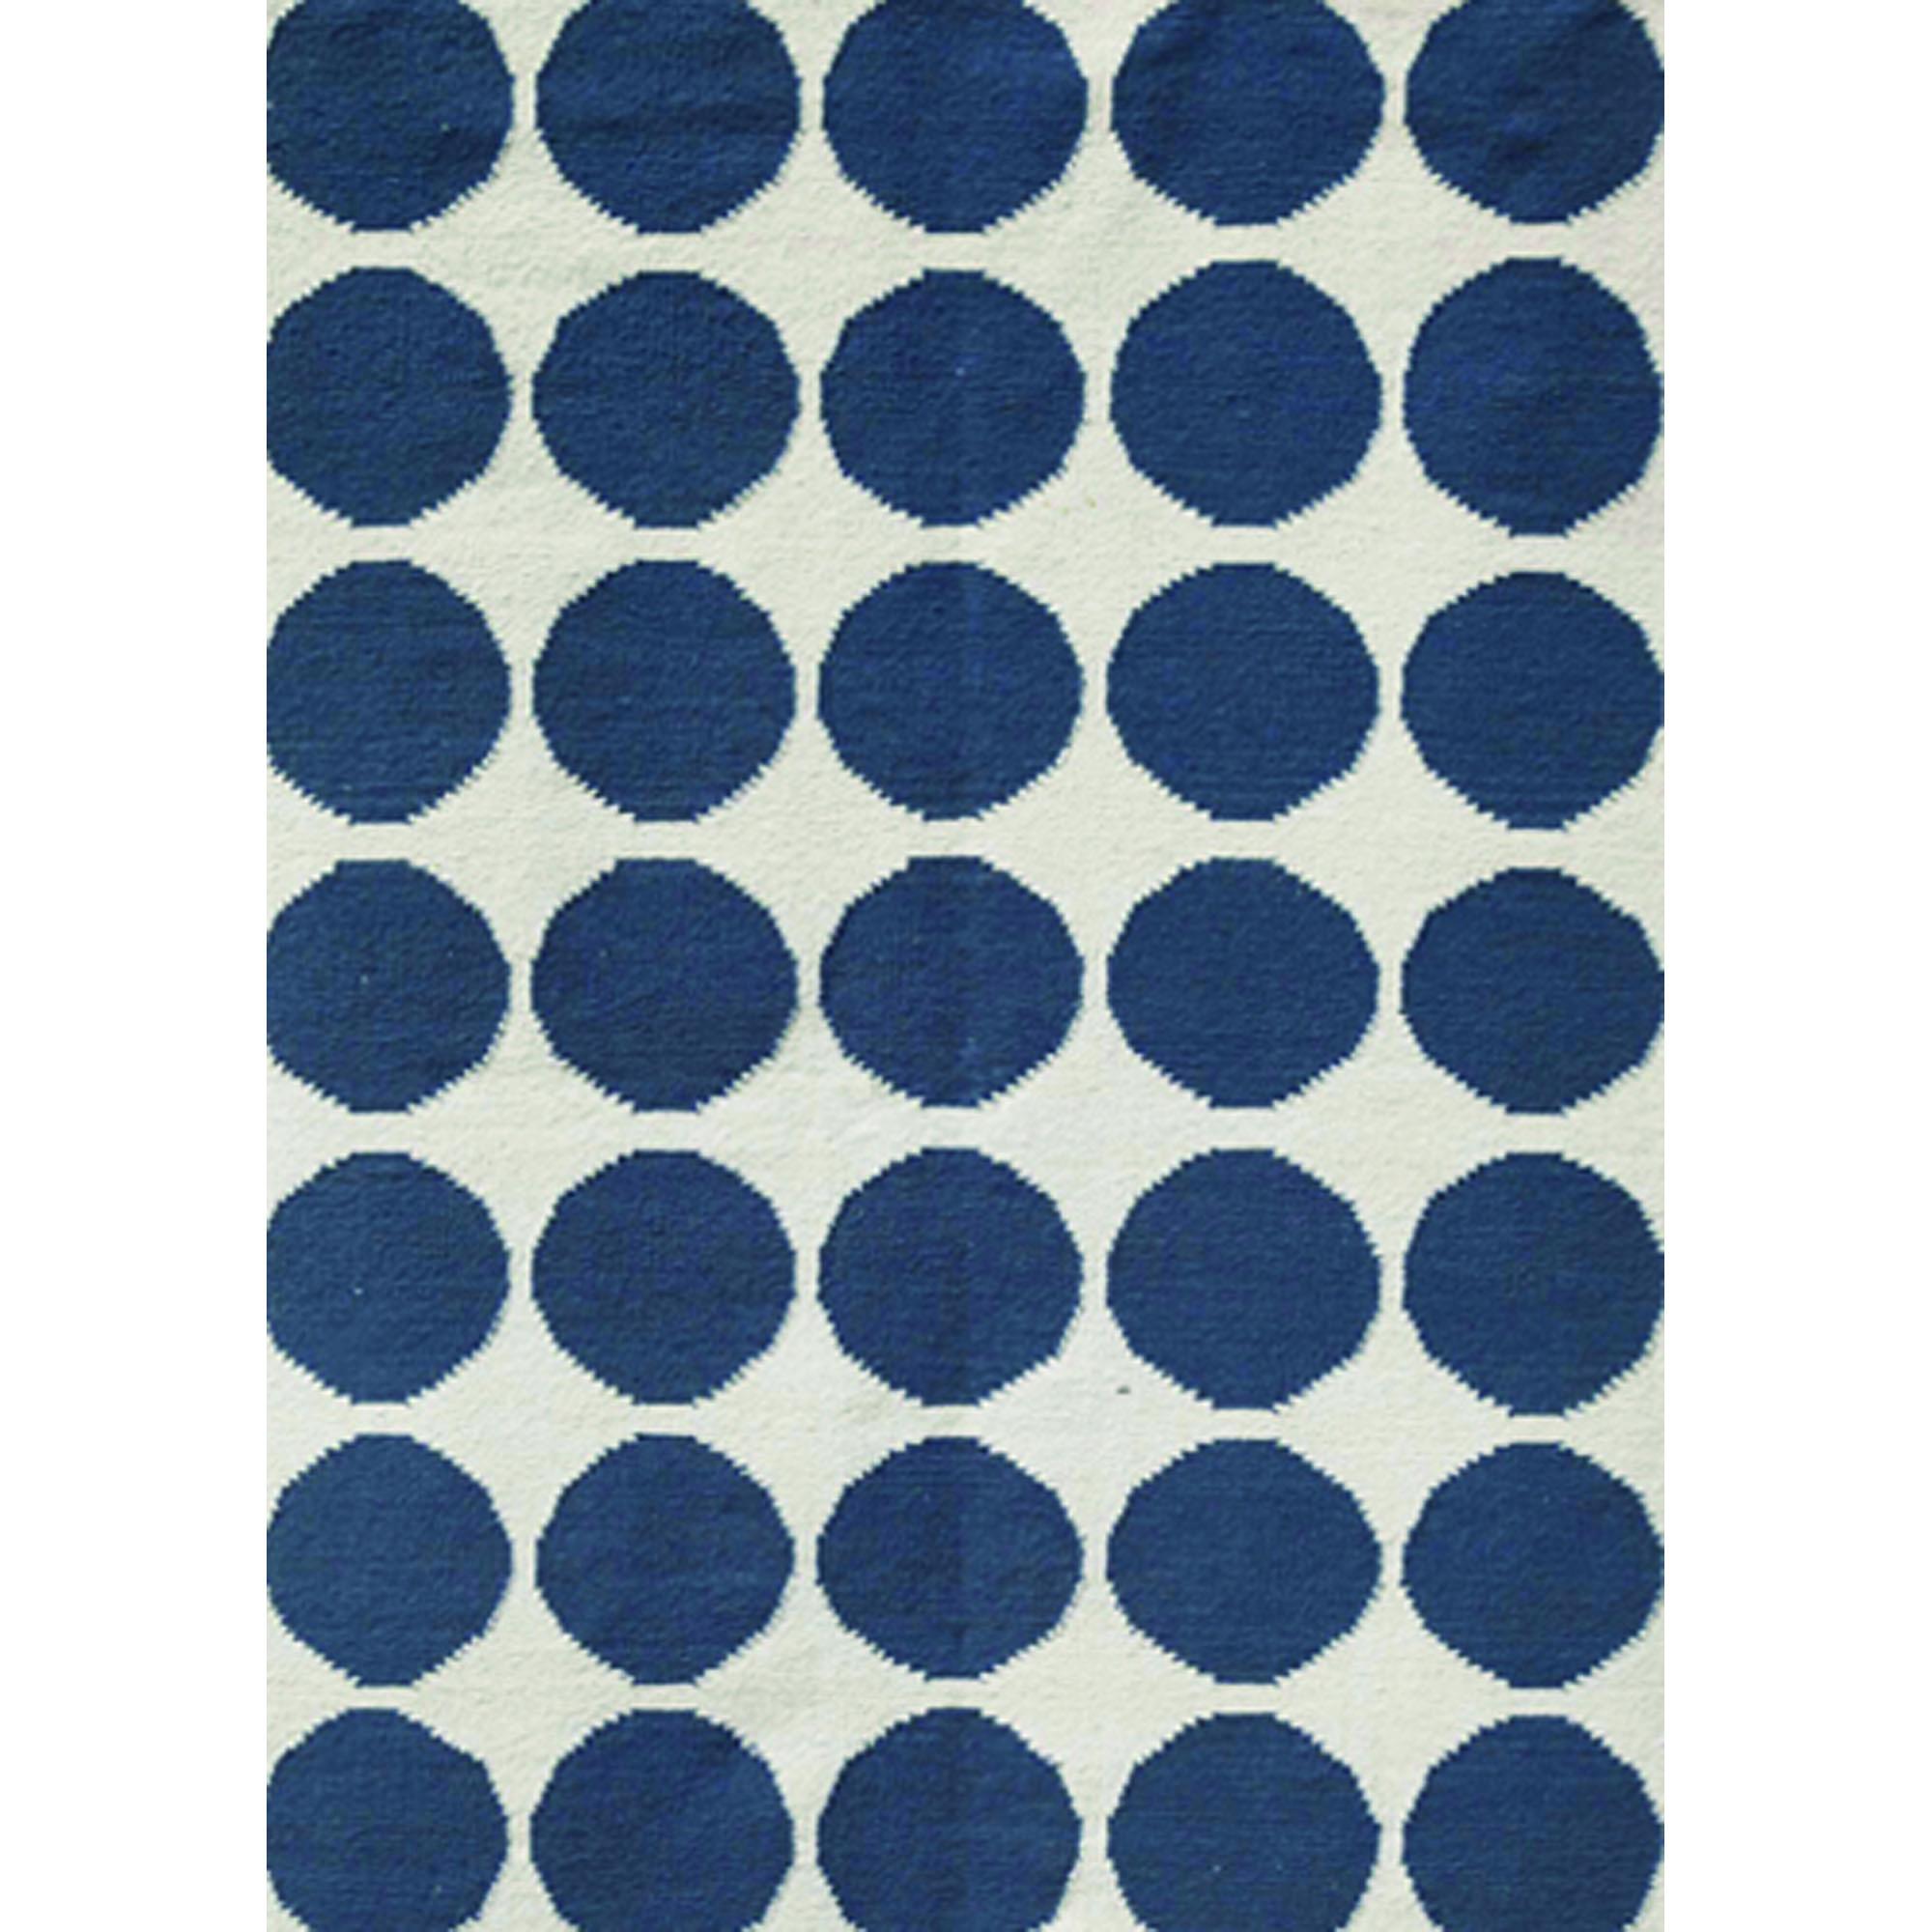 JAIPUR Rugs Maroc 8 x 10 Rug - Item Number: RUG102573